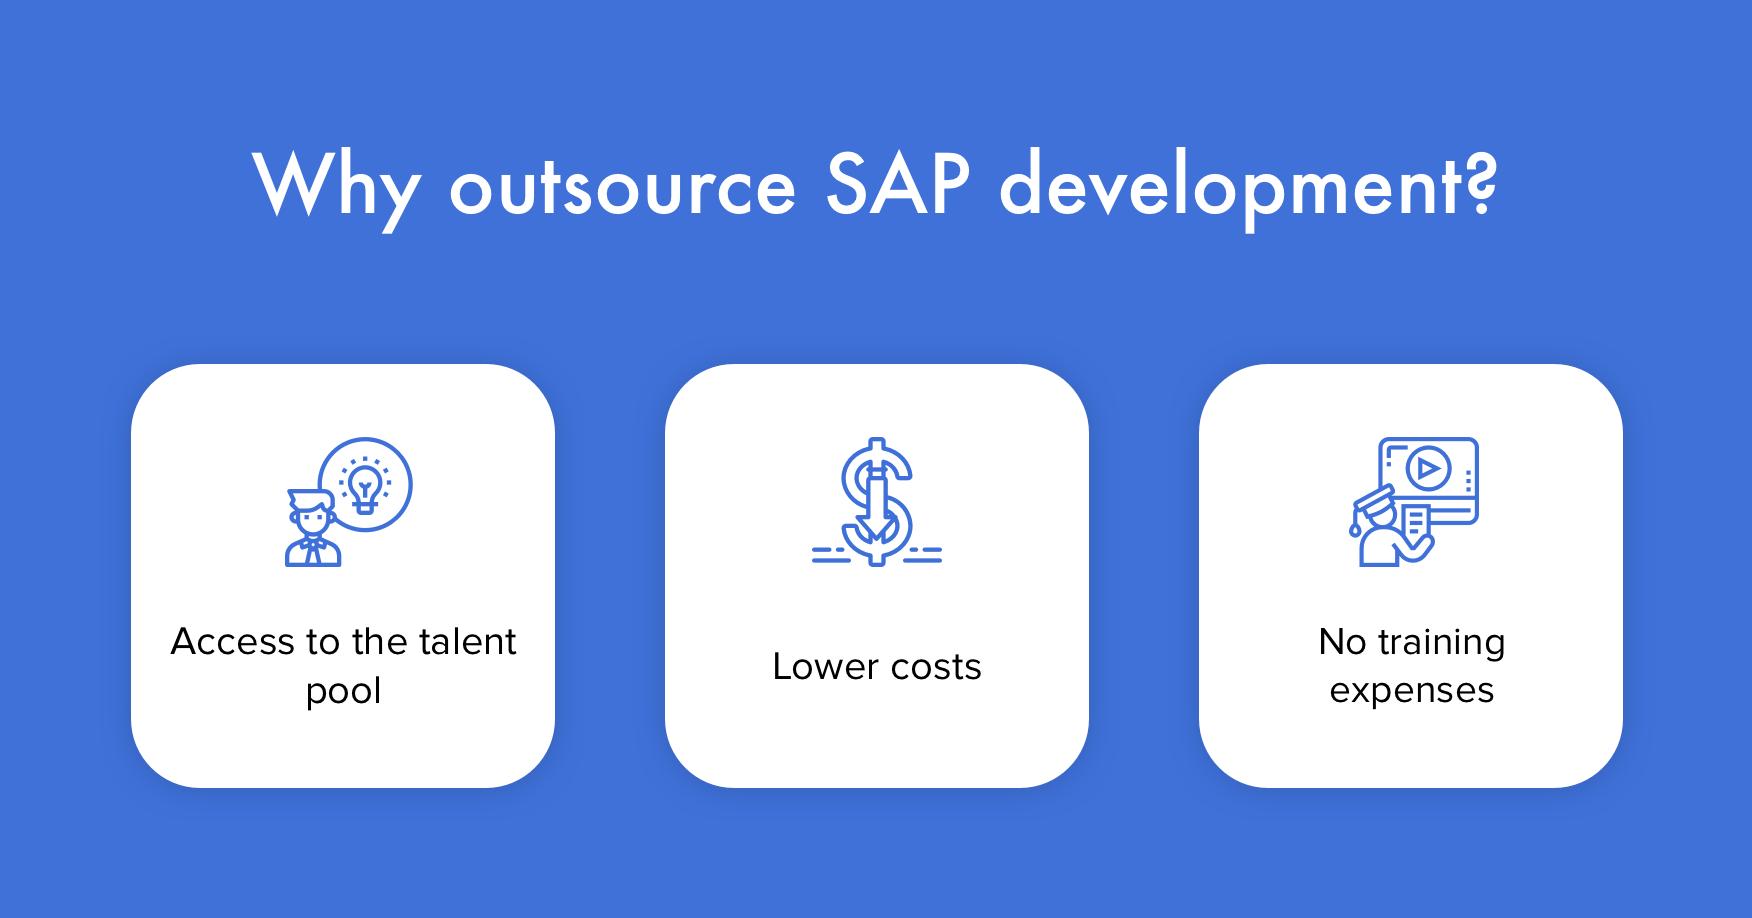 Why outsource SAP development